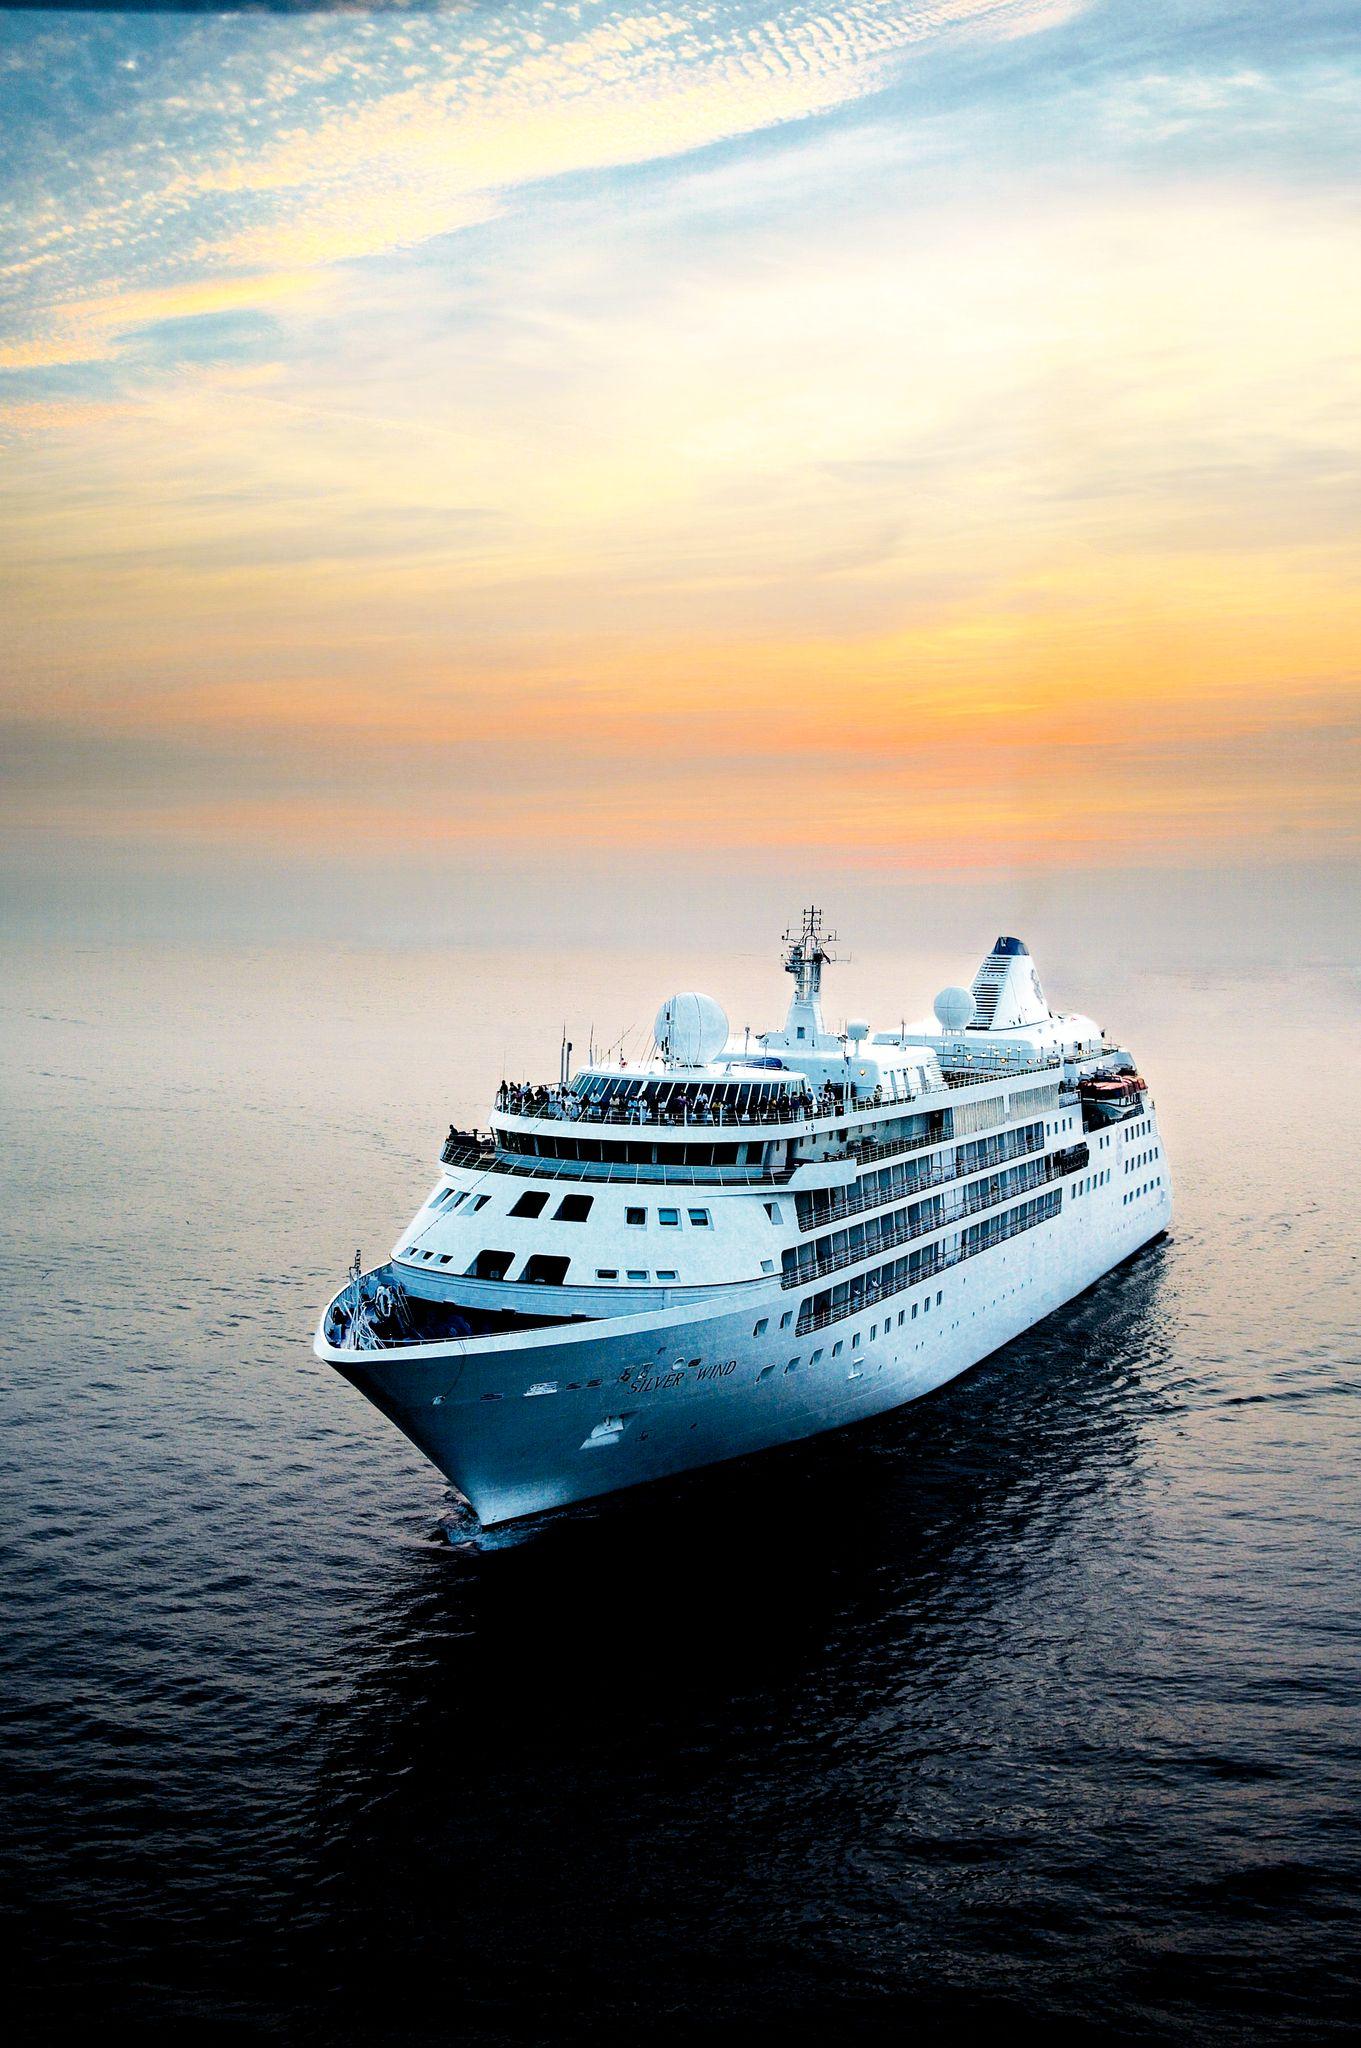 Holidays 2021 2022 Thomas Cook Cruise Travel Silversea Cruises Beach Honeymoon Destinations